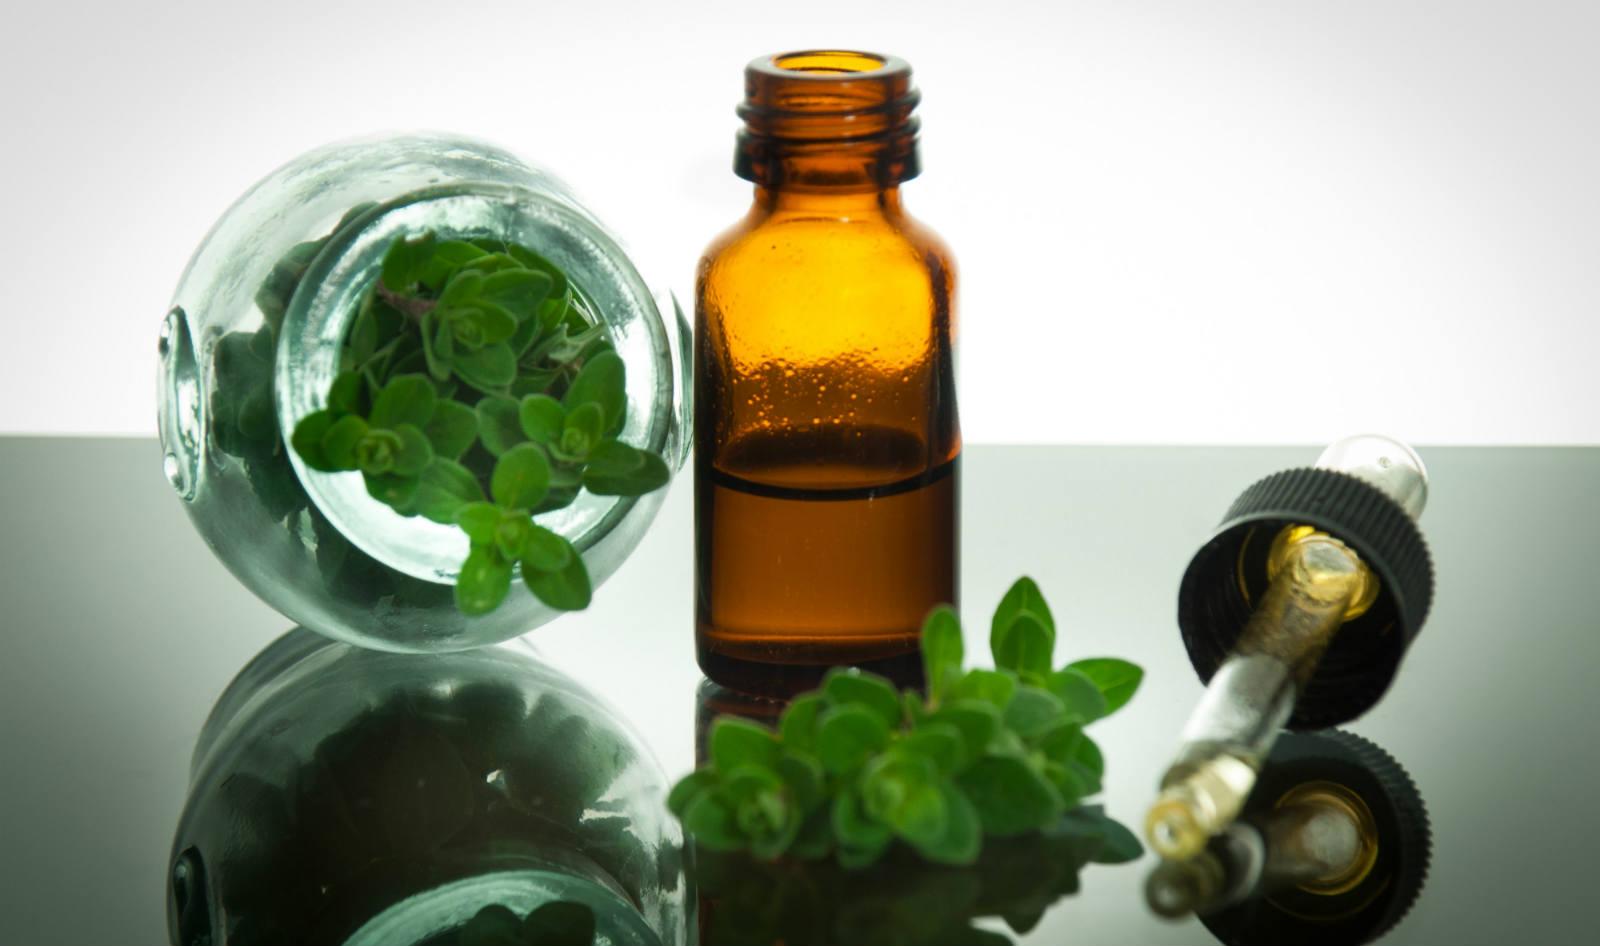 aceite, orégano, oregano, para que sirve, propiedades, medicinal, beneficios